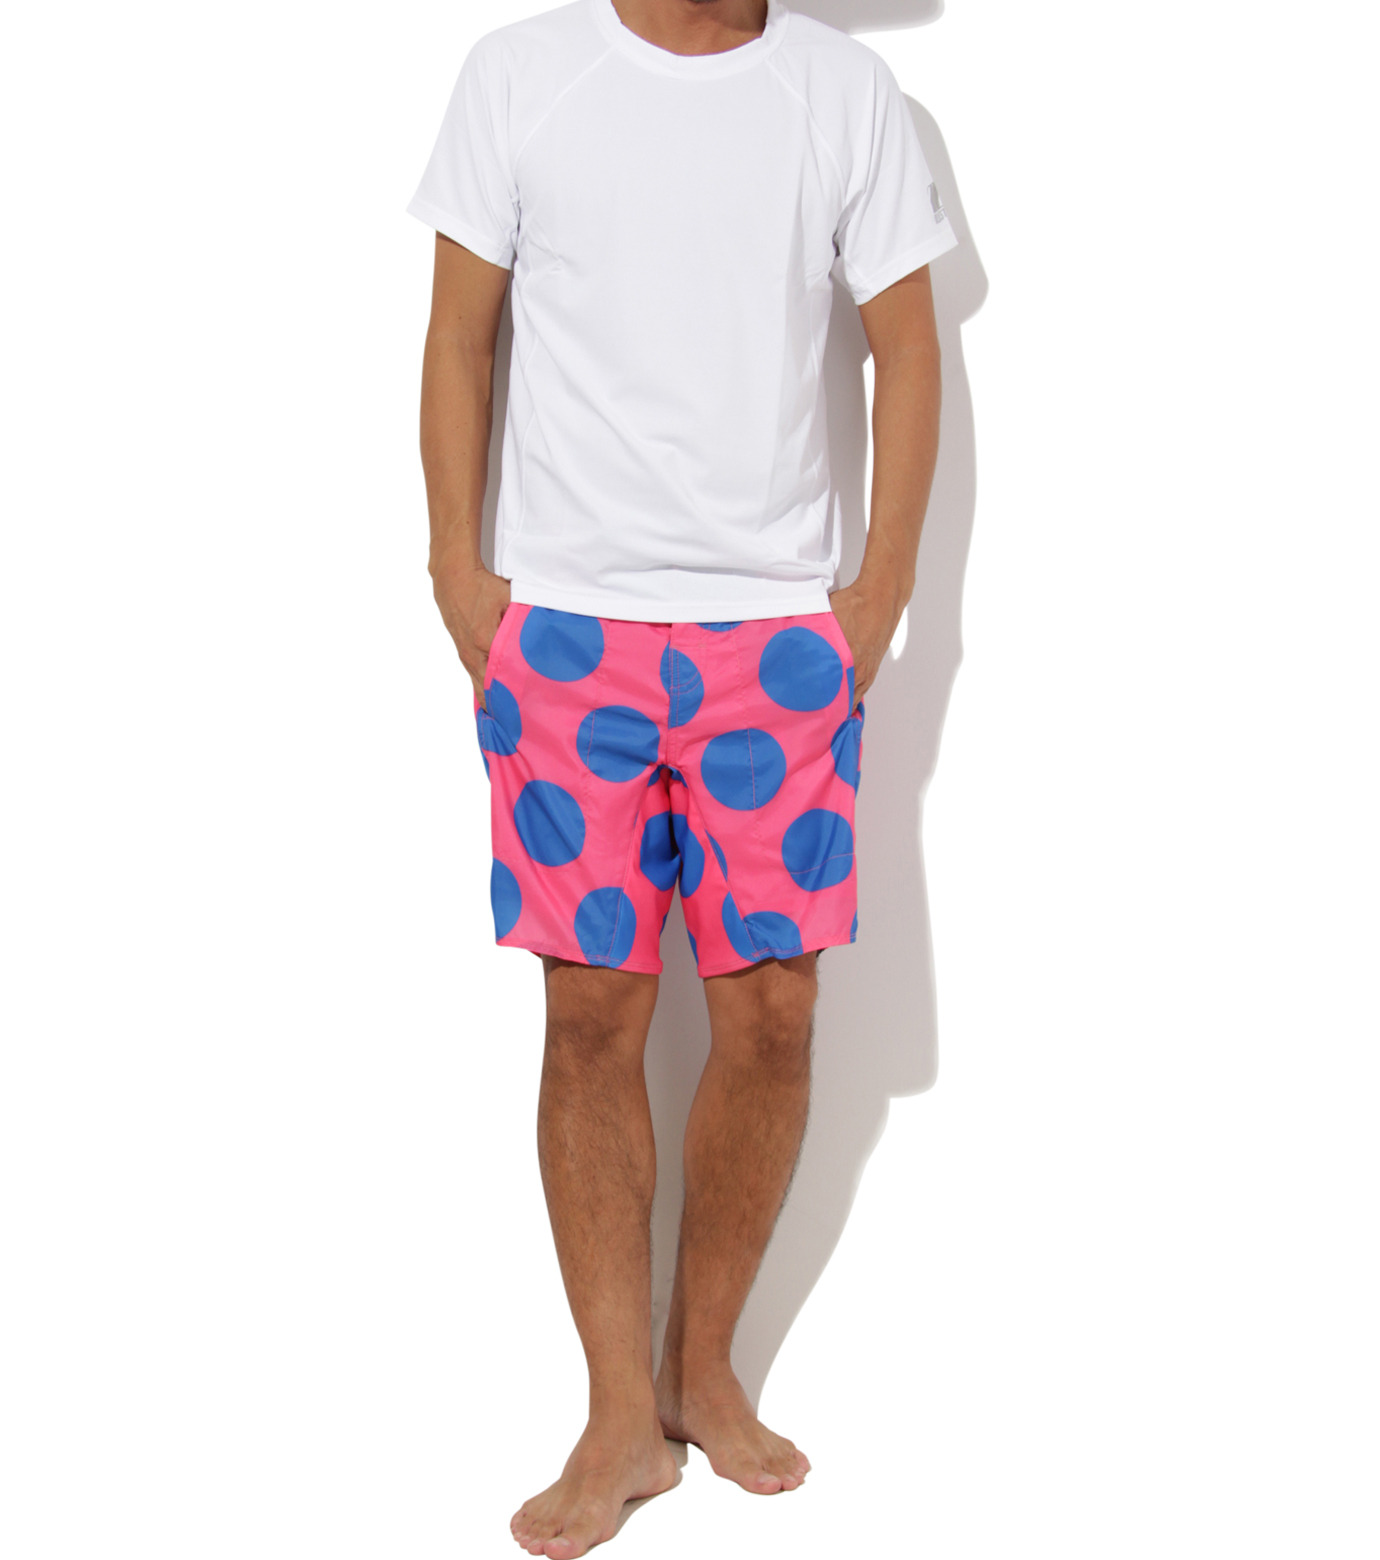 TWO TWO ONE(トゥートゥーワン)のDot surf shorts-SALMON PINK(SWIMWEAR/SWIMWEAR)-15N98003-73 拡大詳細画像5